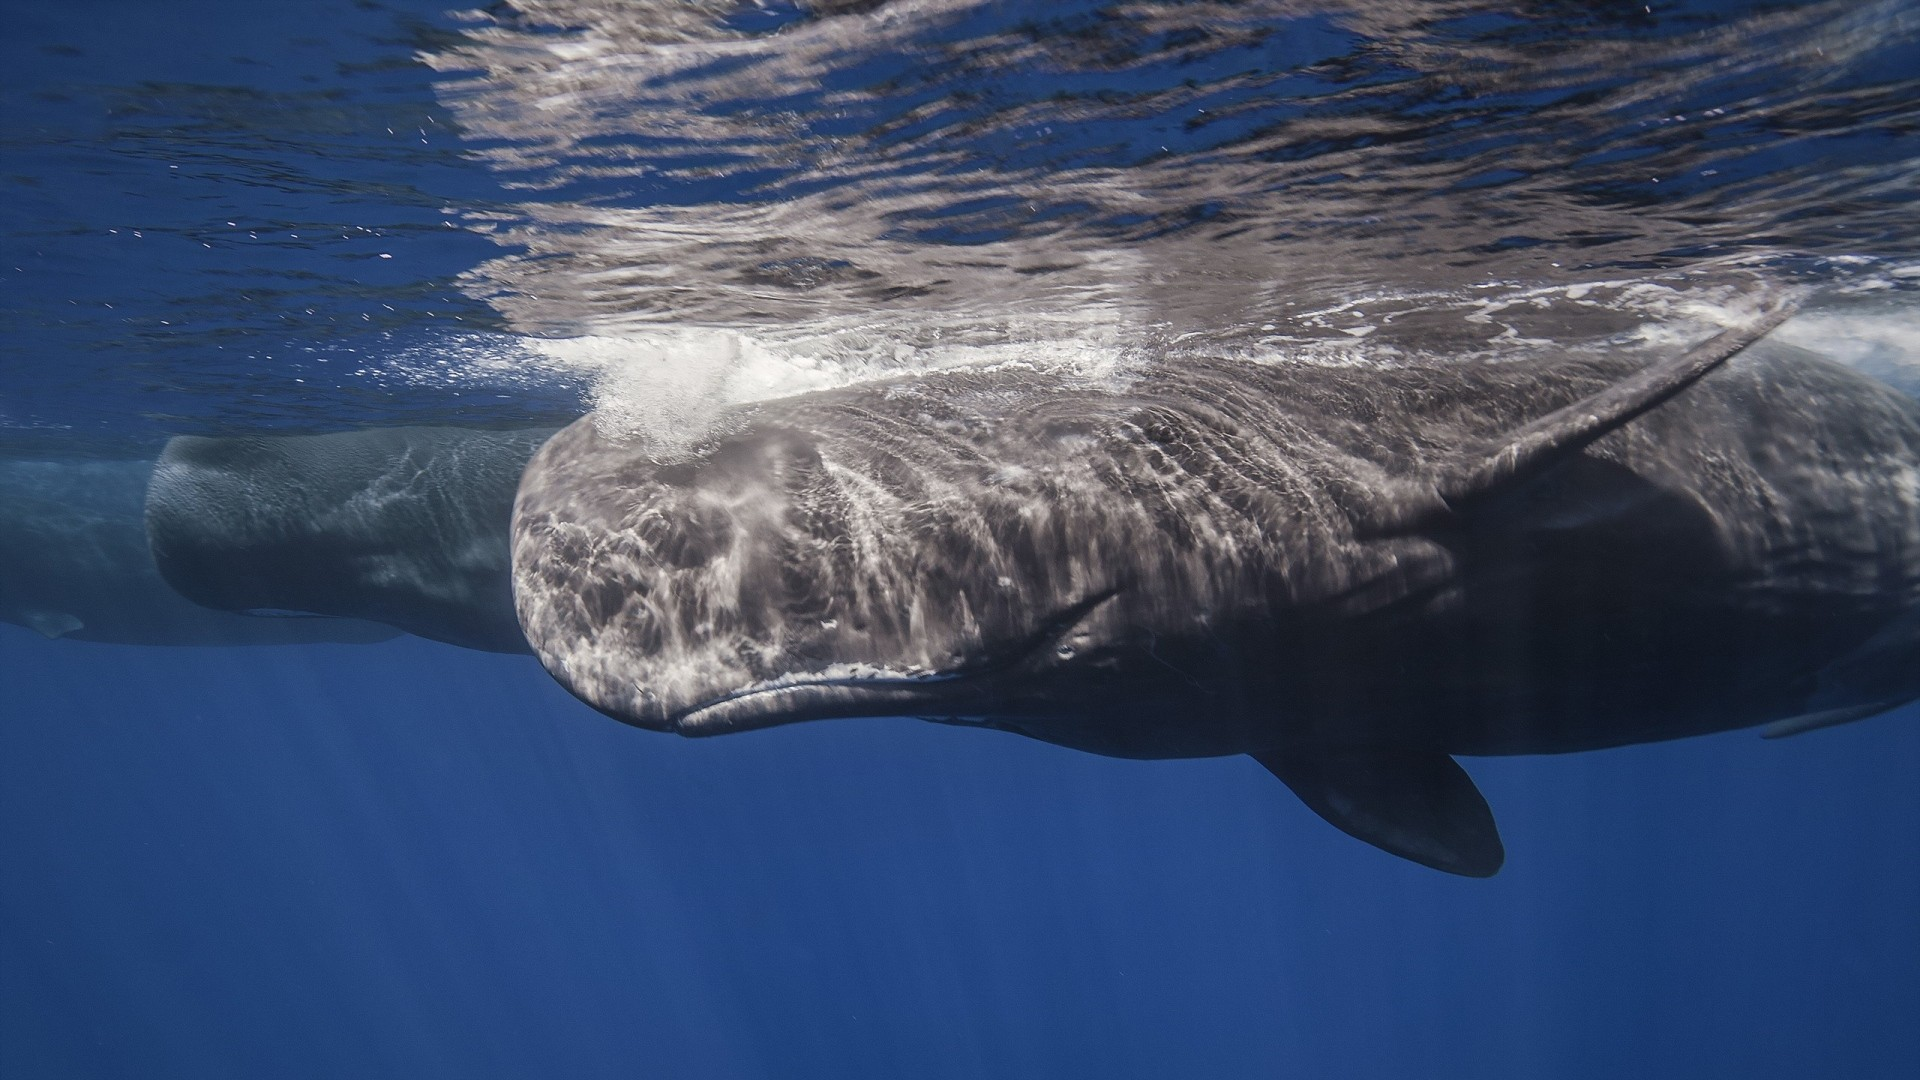 S8 Whale Wallpaper 4k Download Labzada Wallpaper